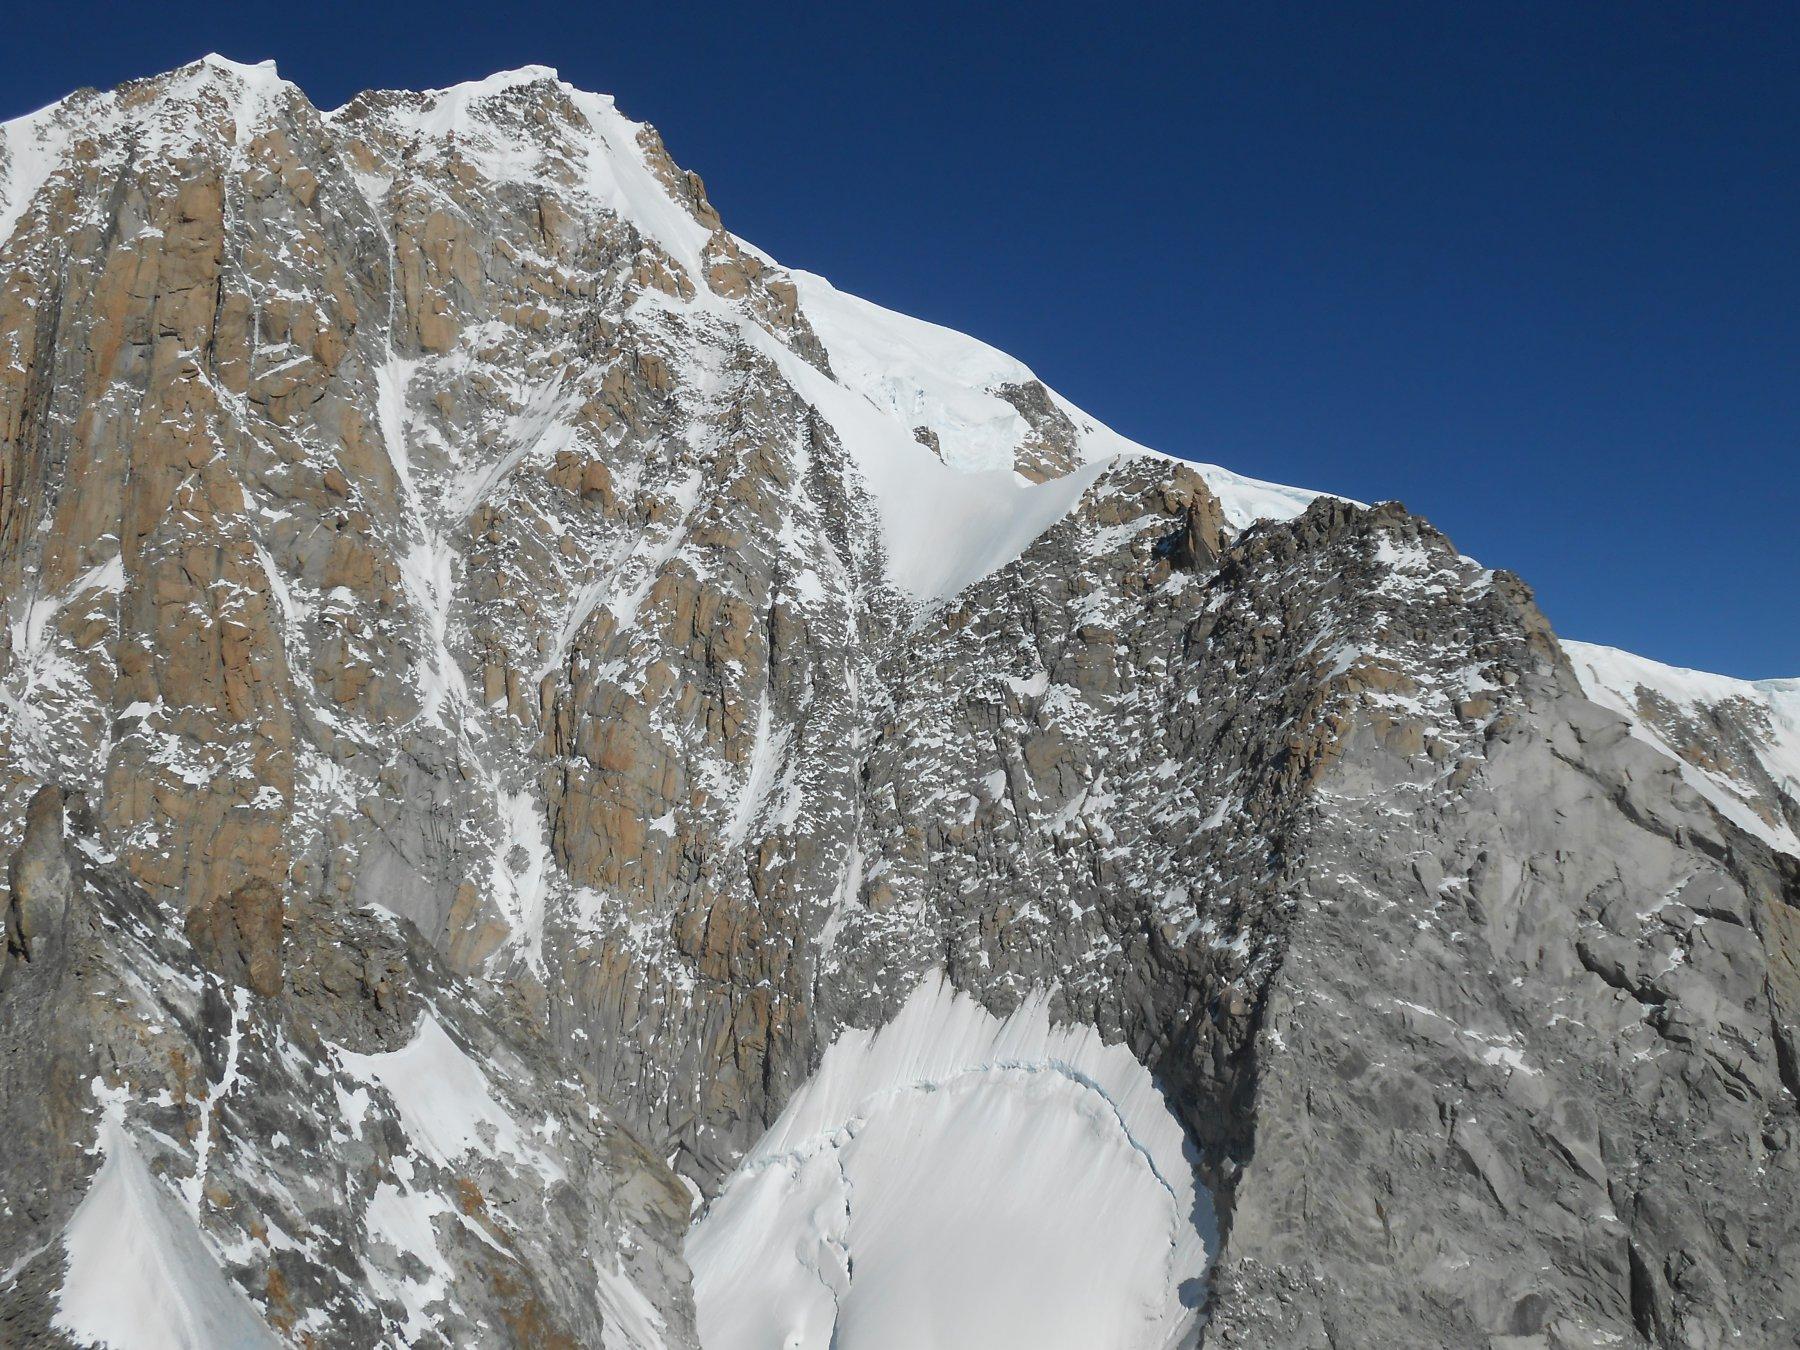 G.P.A. e Mont Blanc de Courmayeur